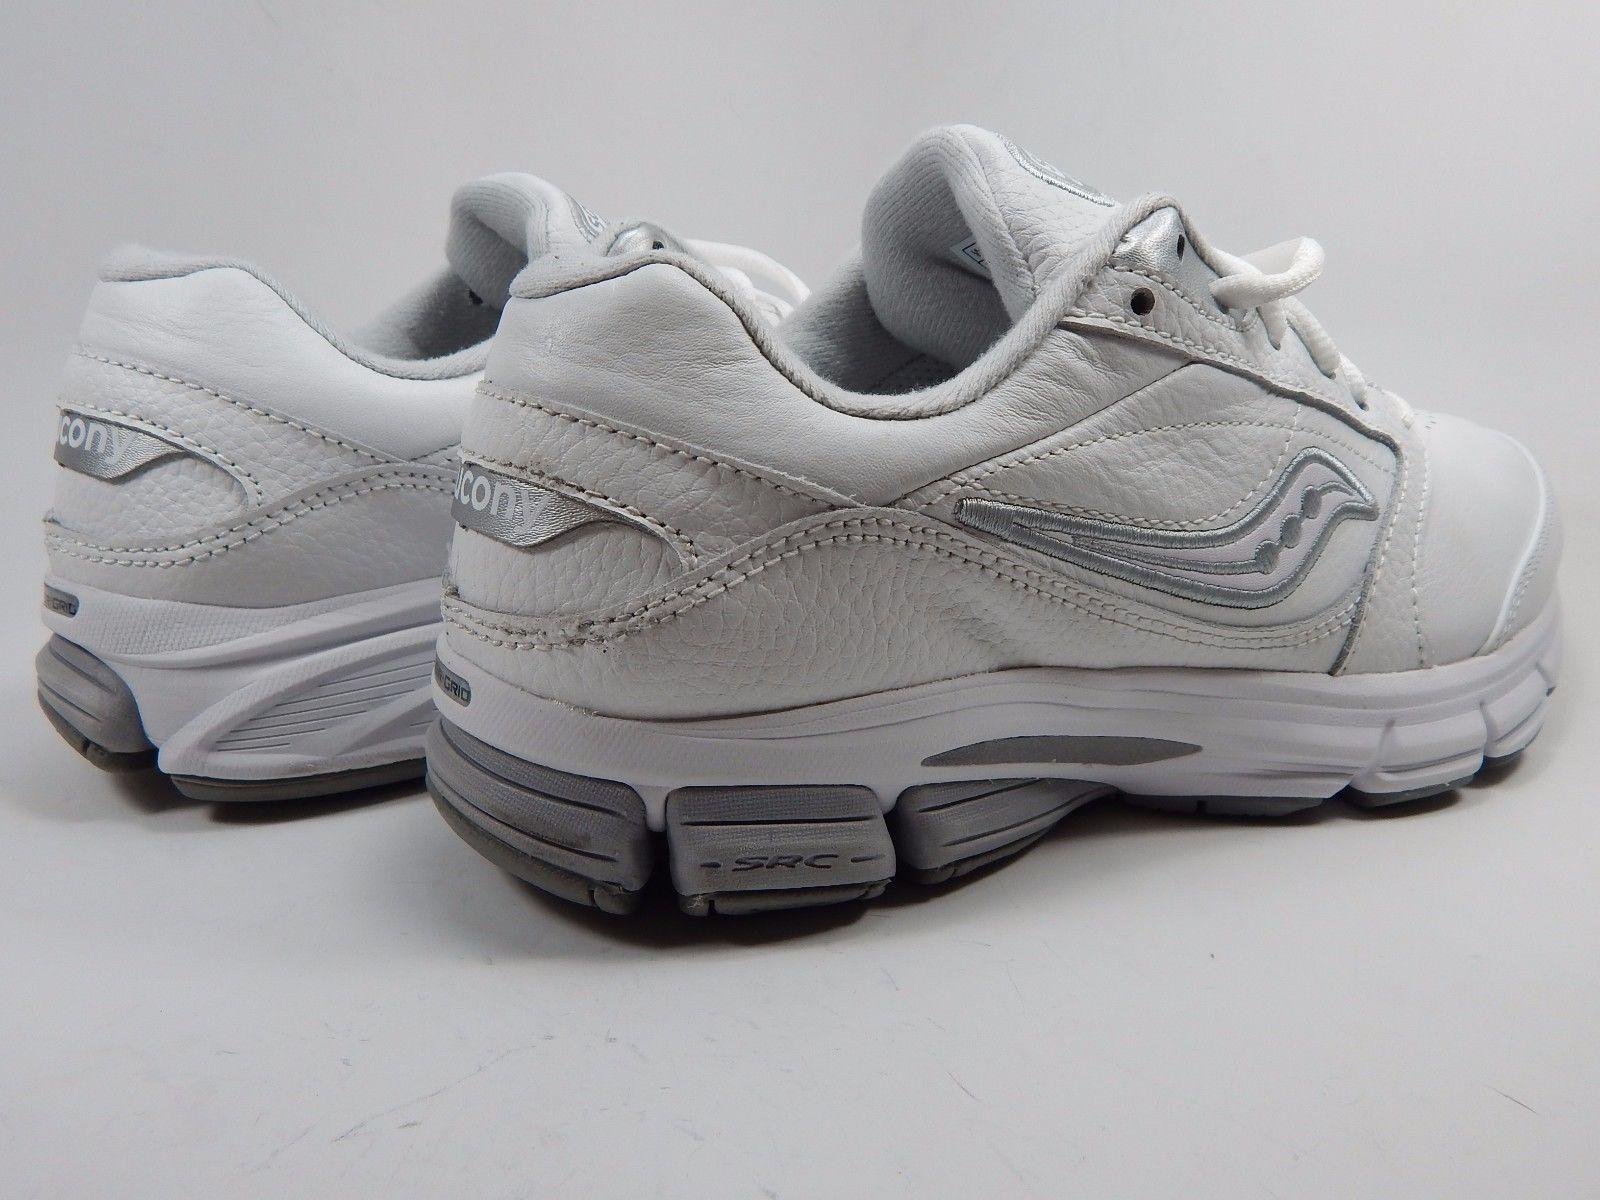 Saucony Echelon LE2 Women's Walking Shoes Size US 9 M (B) EU 40.5 White 15173-1